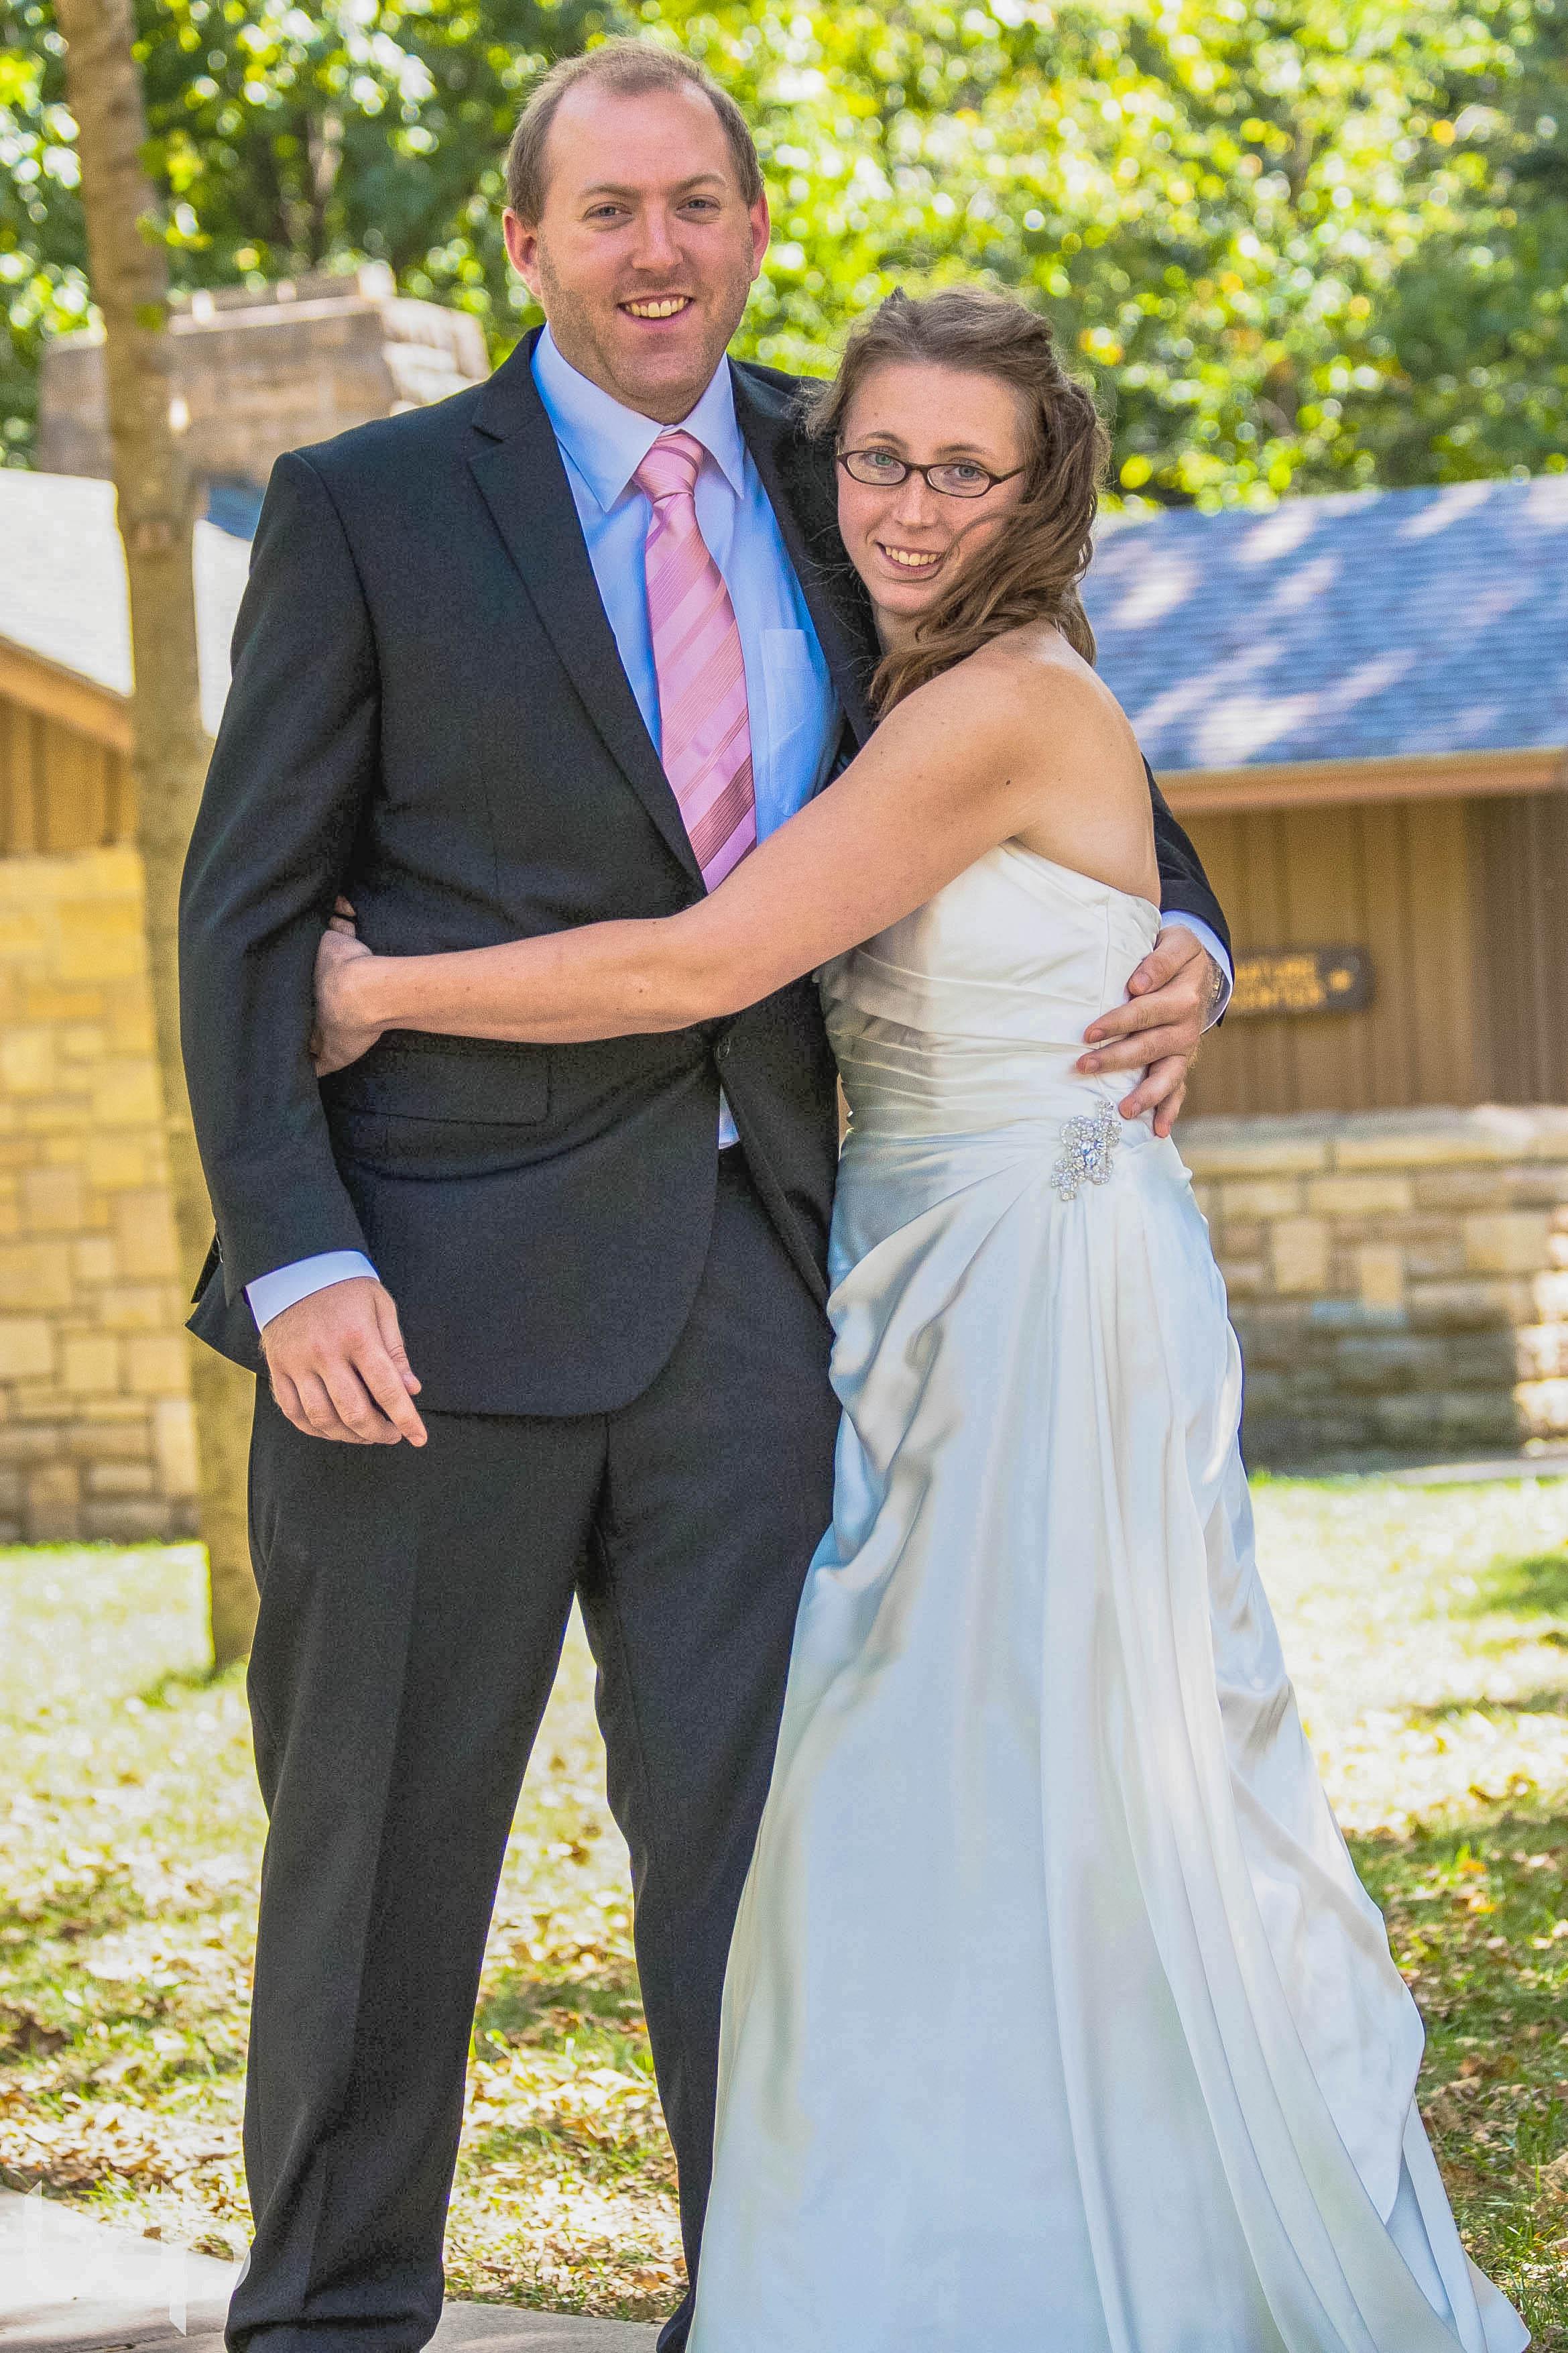 Scott and Rena's Wedding 090812 BDP SQ-22.jpg